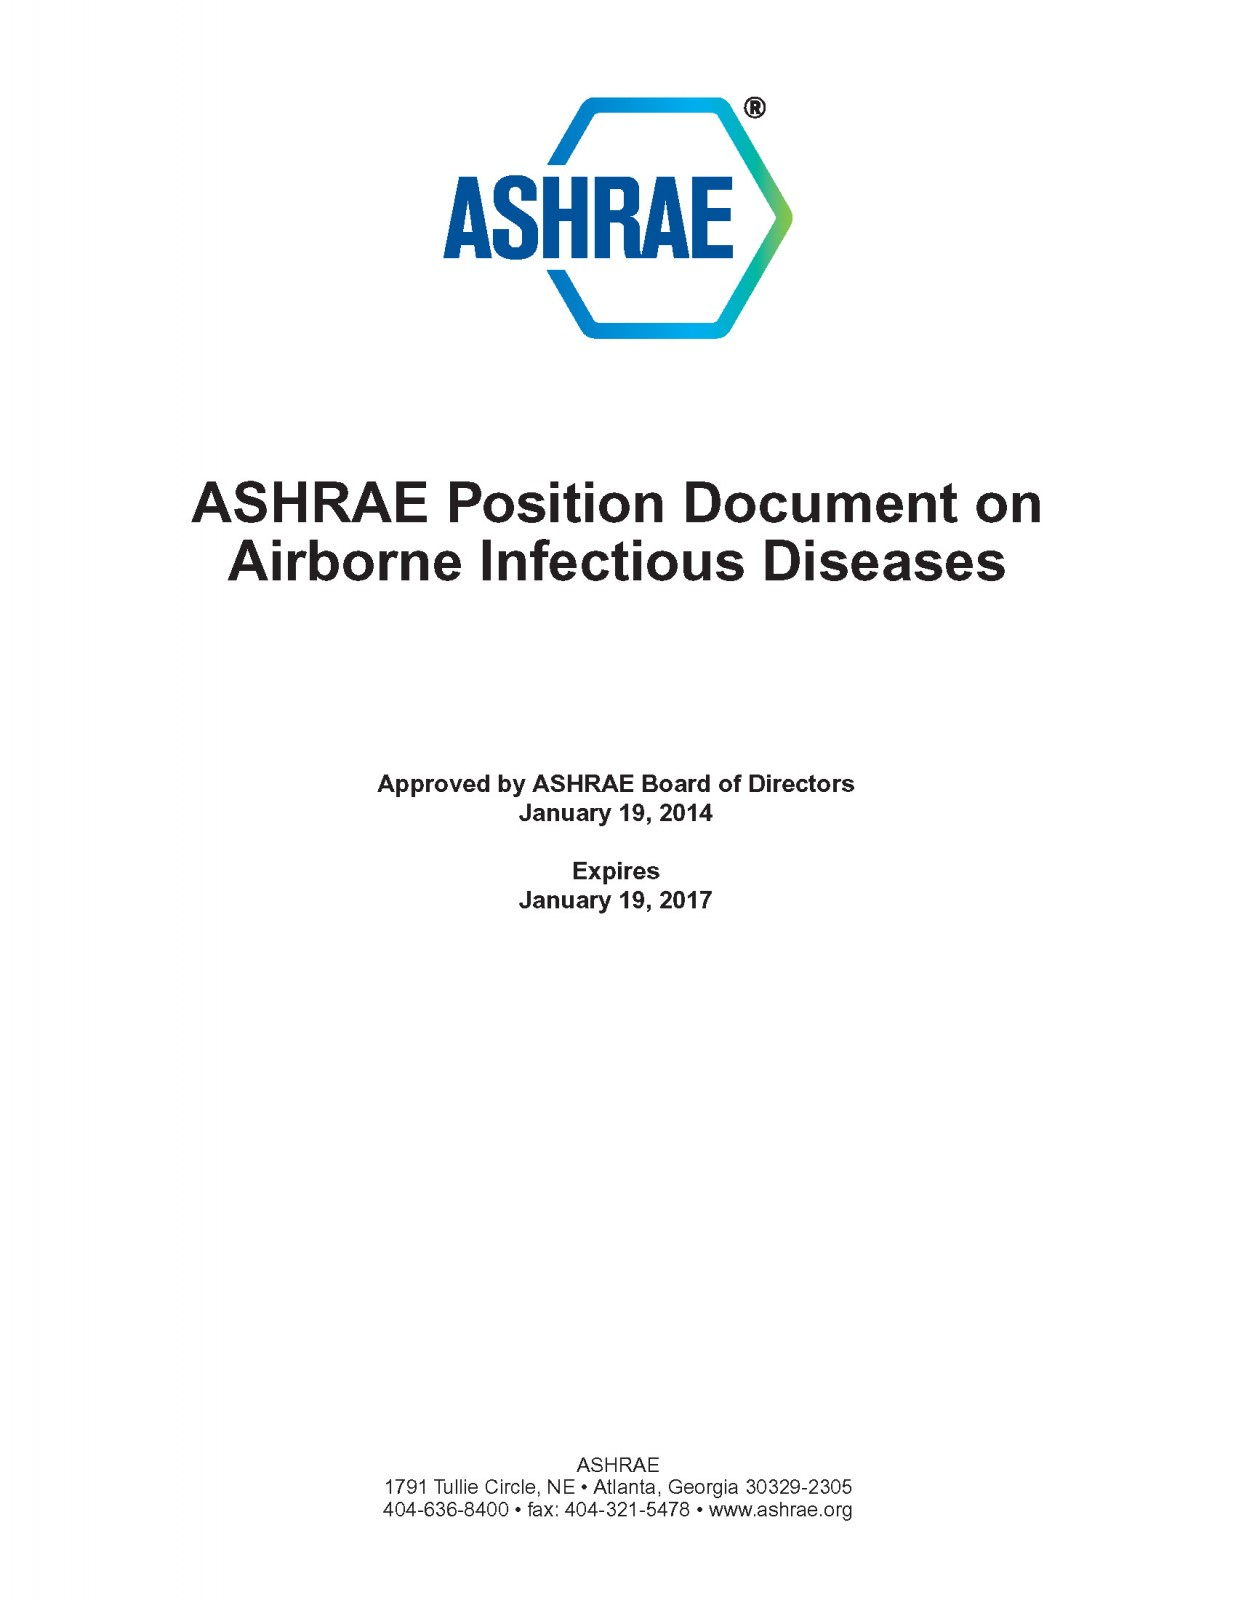 ASHRAE Position Paper